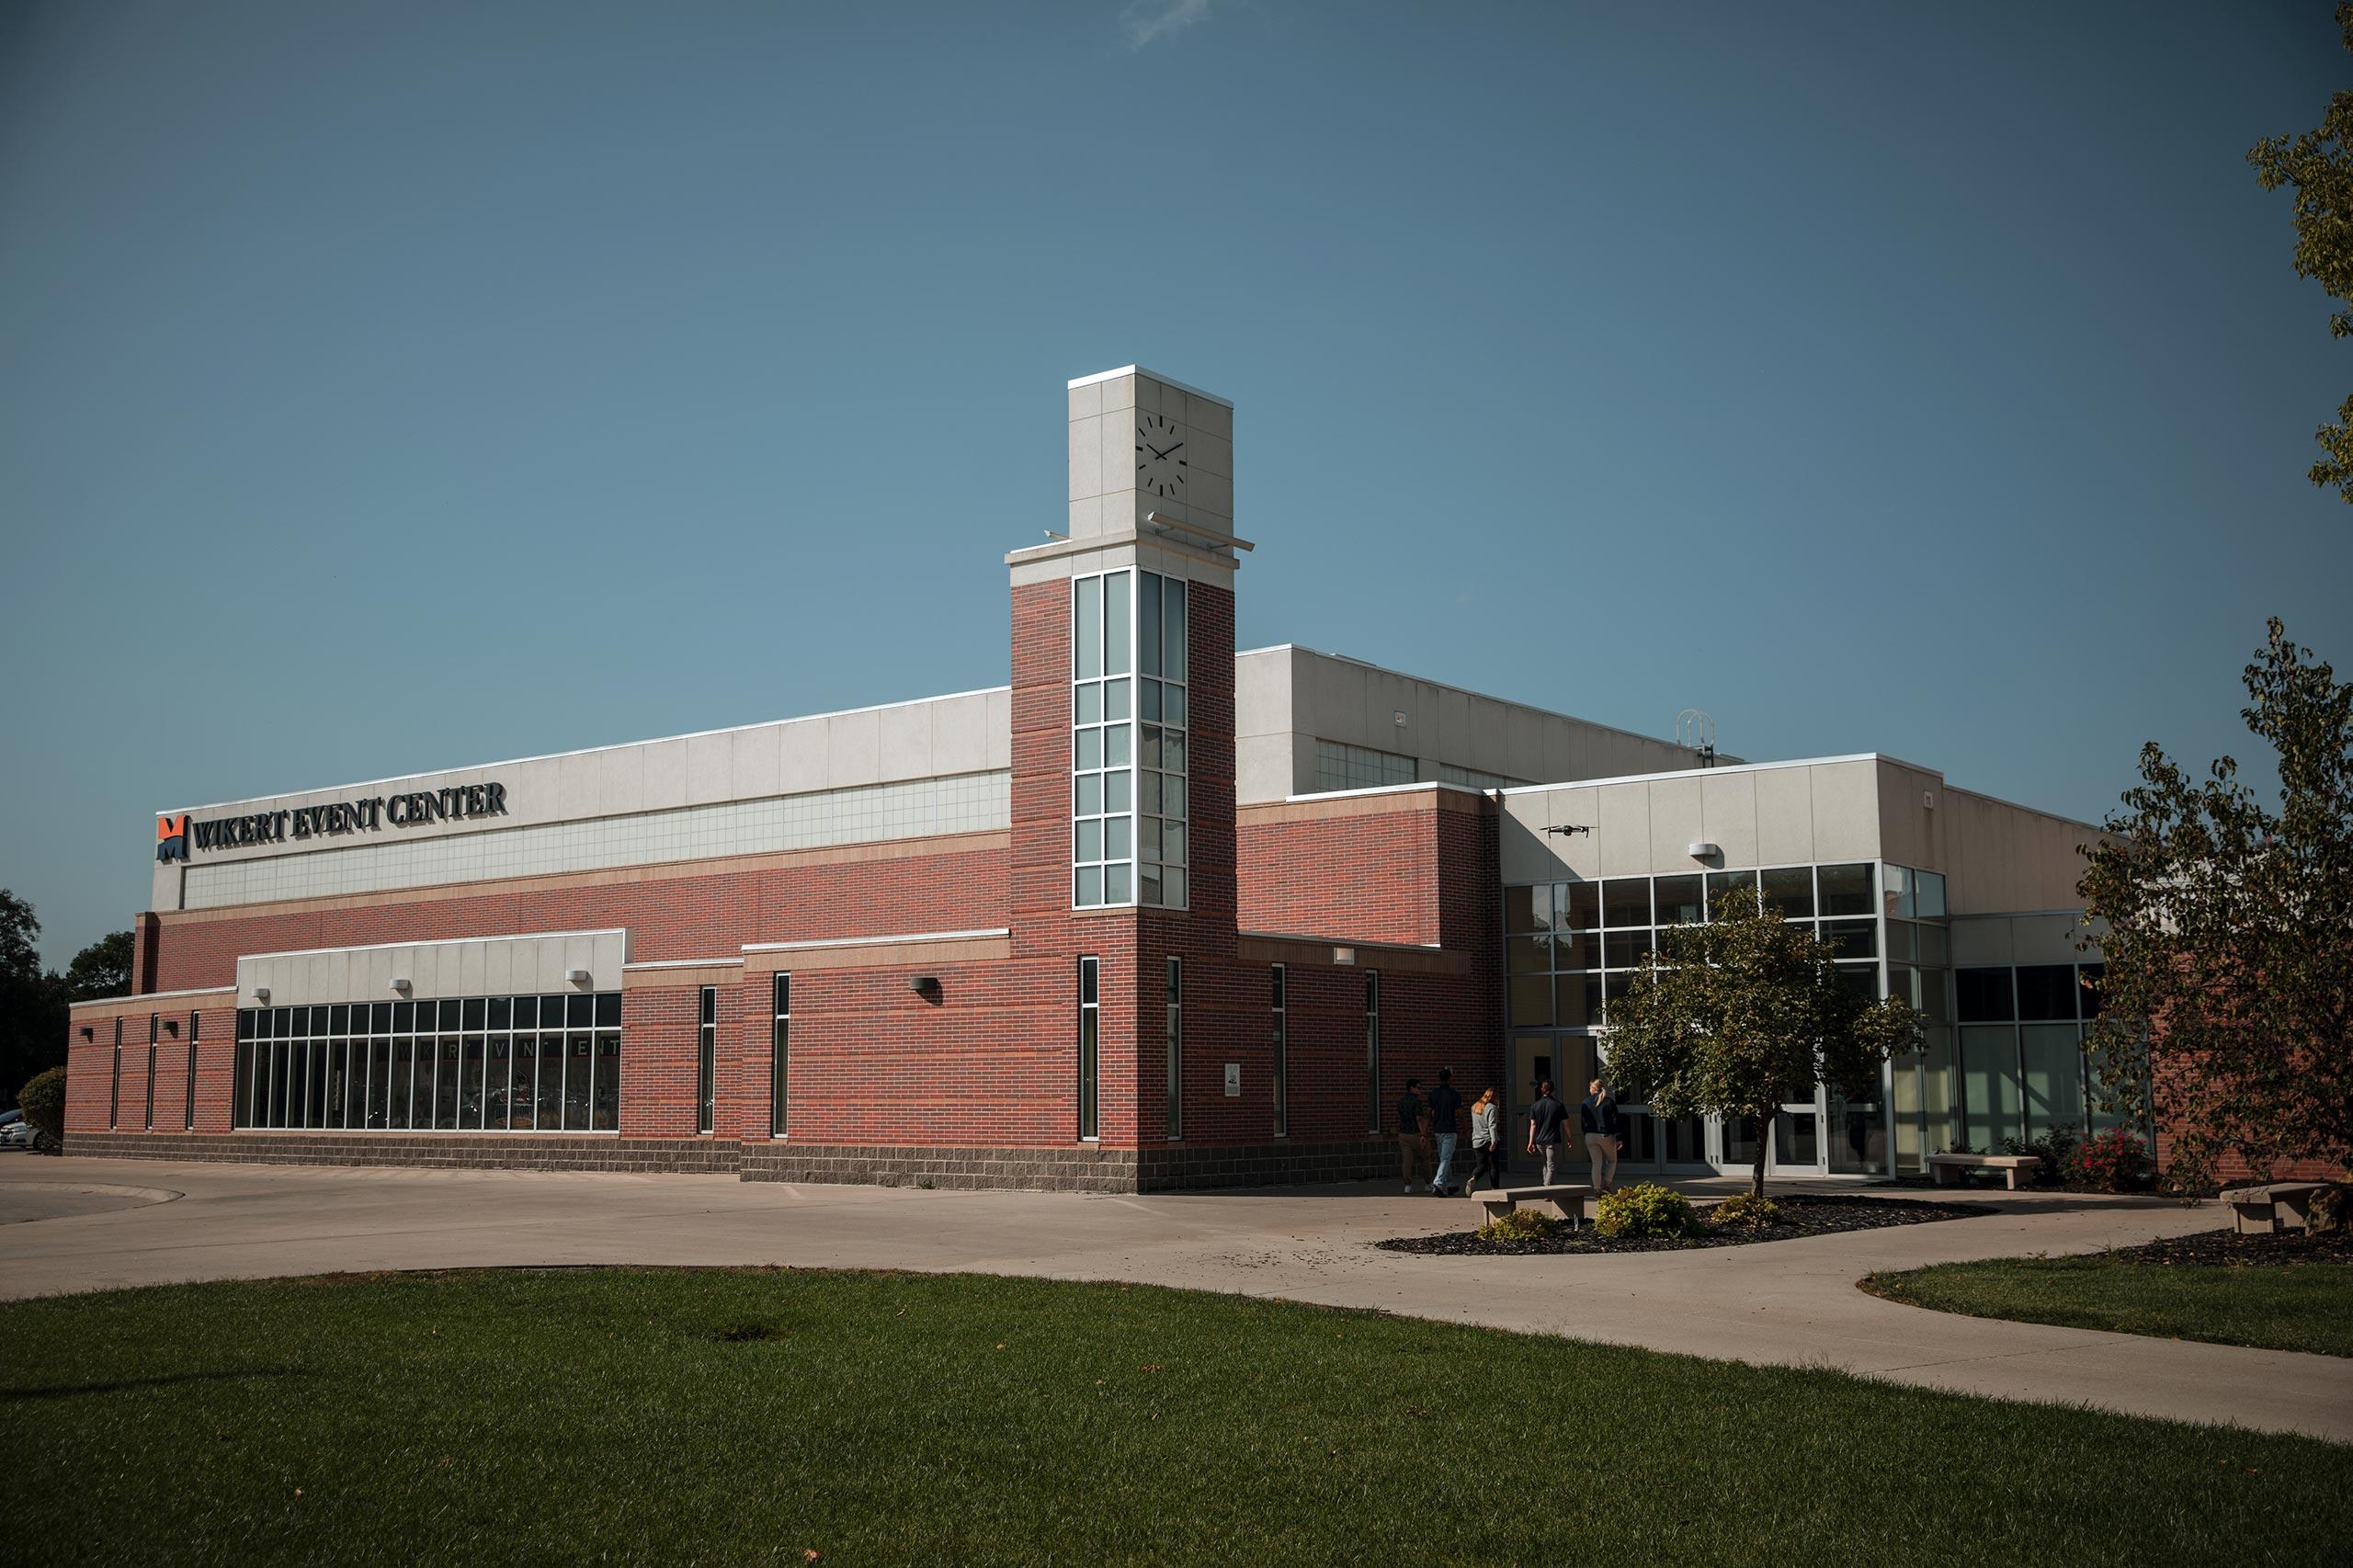 Wikert Event Center at Midland University